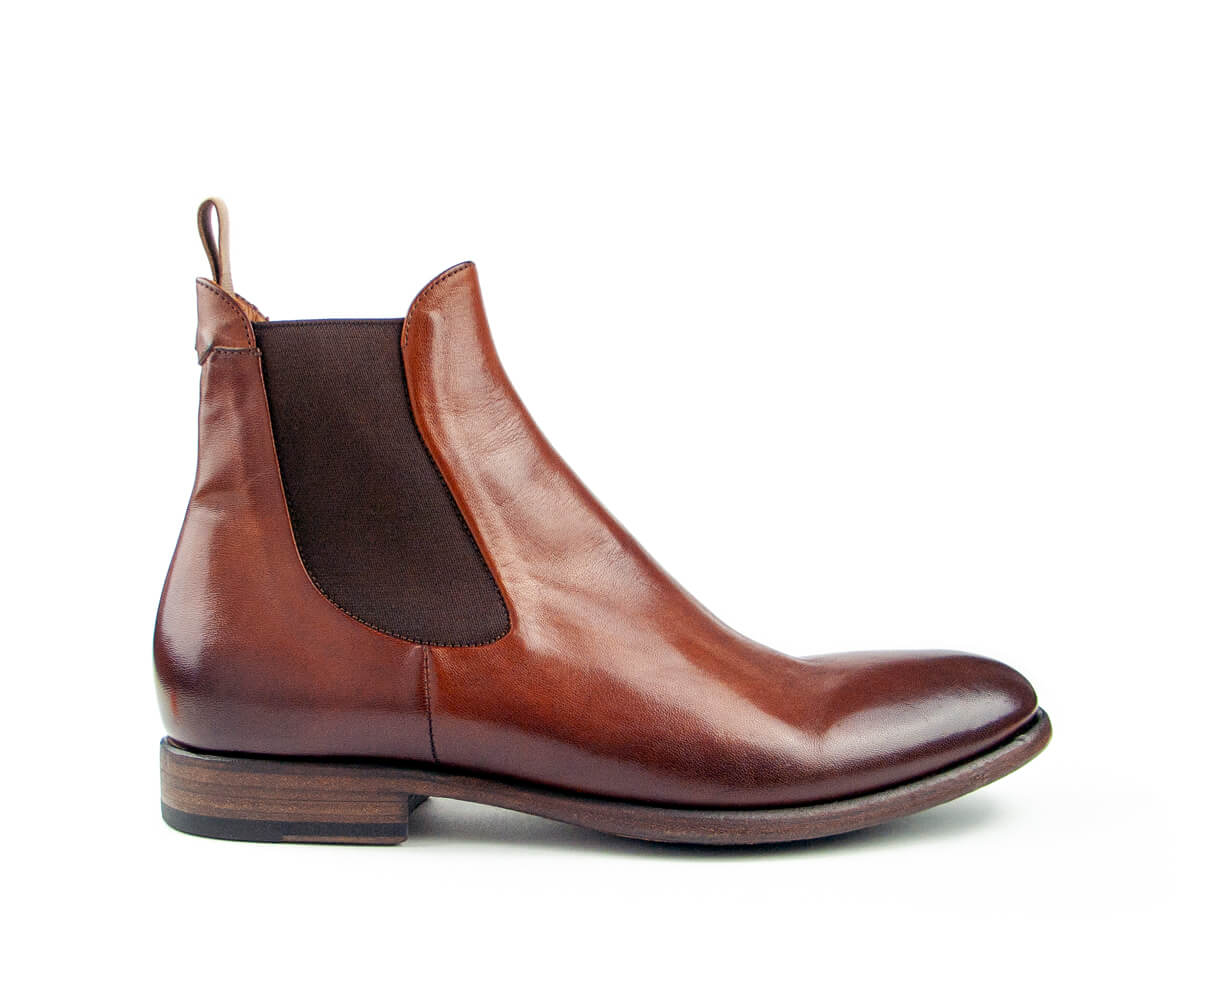 016 ecla scarpe rgb